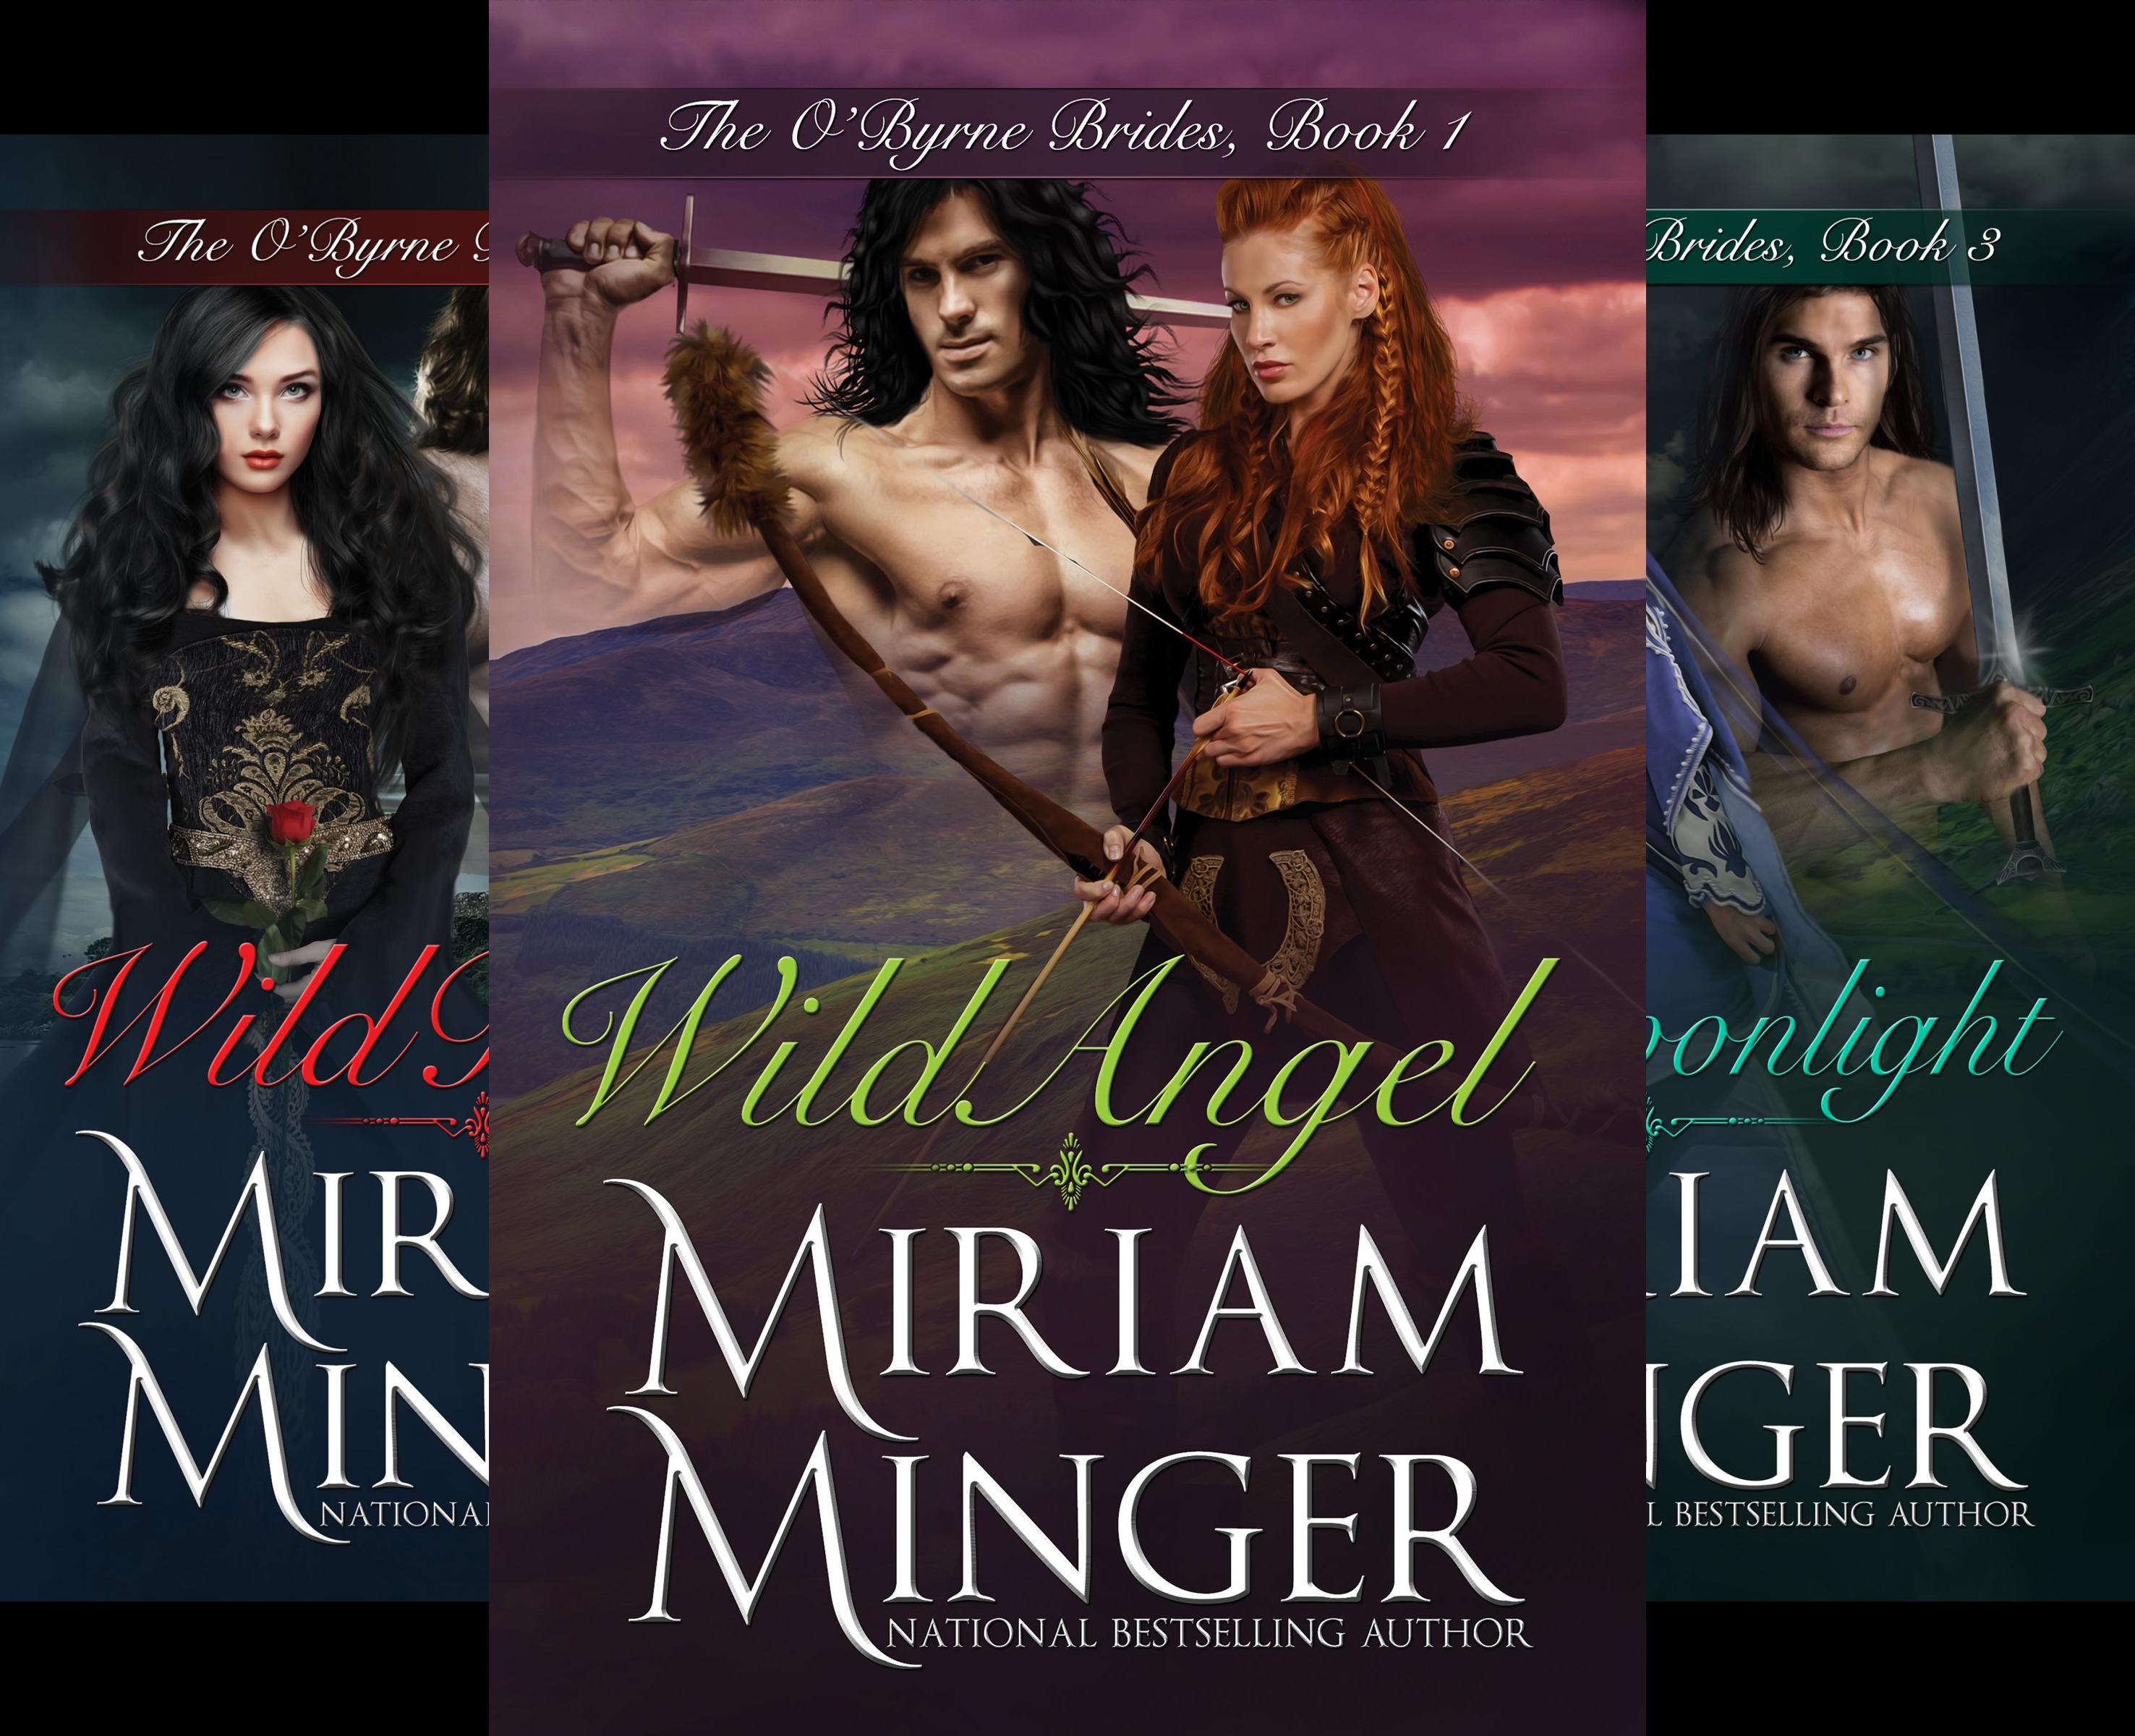 The O'Byrne Brides Series (4 Book Series) (Miriam Minger Ebooks)